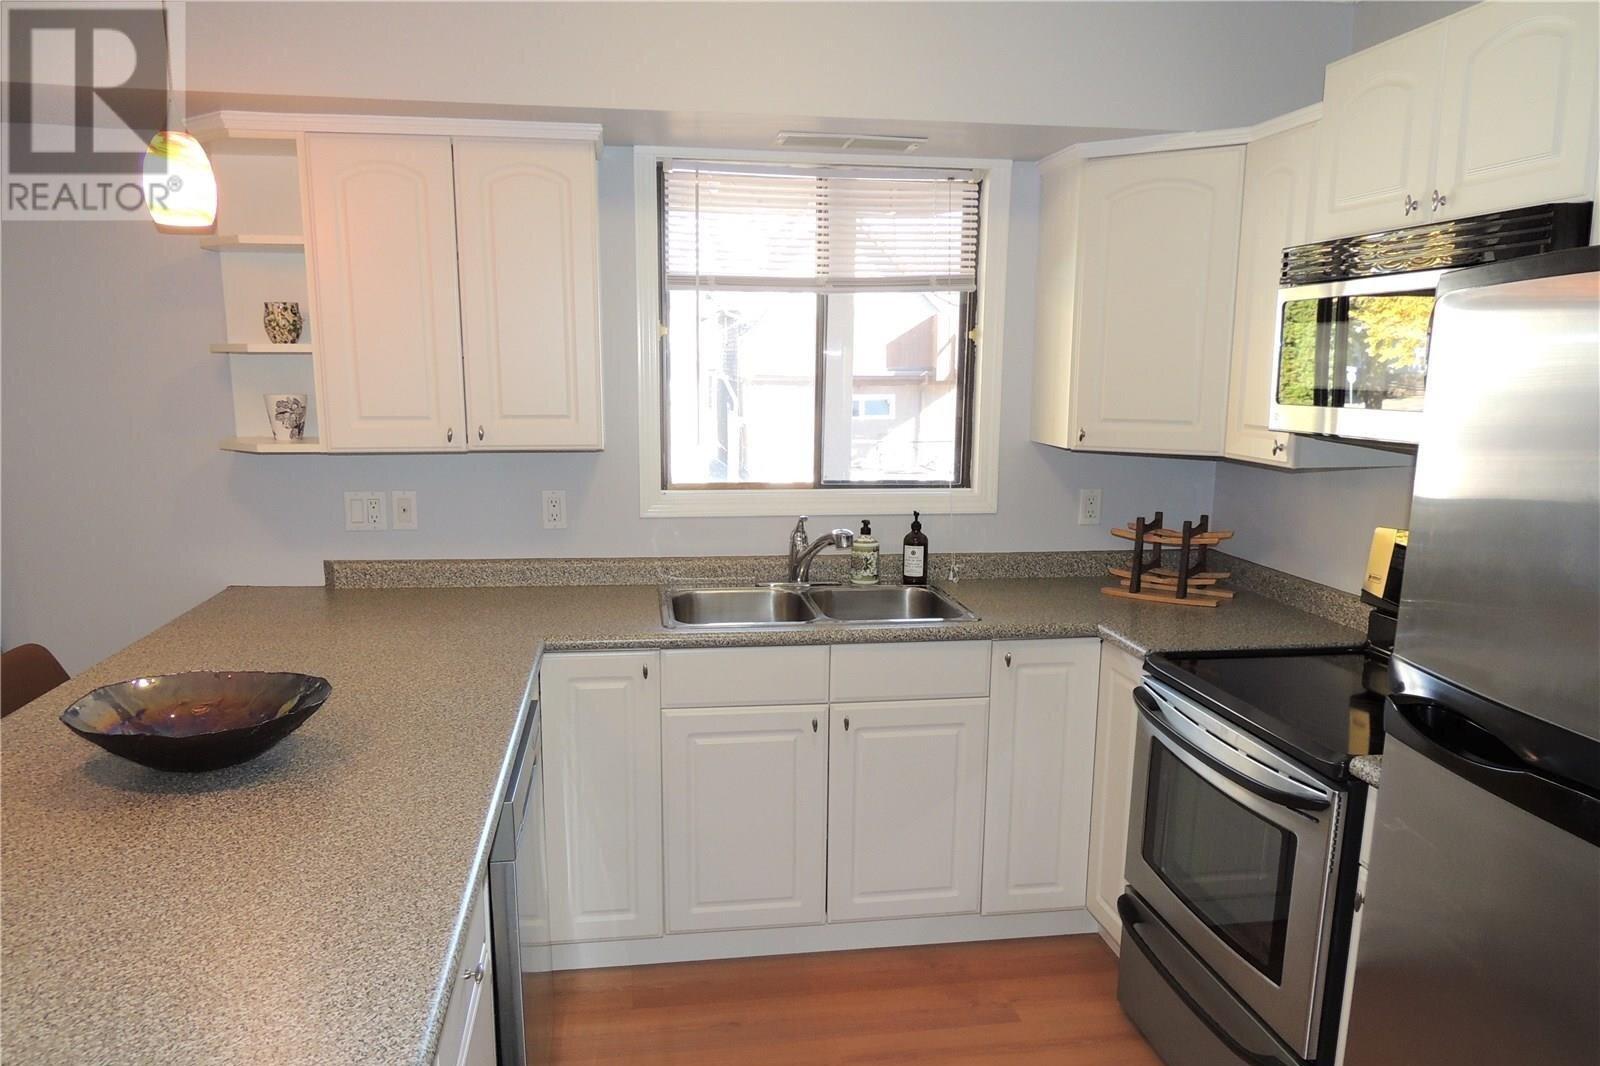 Condo for sale at 2315 Mcintyre St Unit 108 Regina Saskatchewan - MLS: SK830173